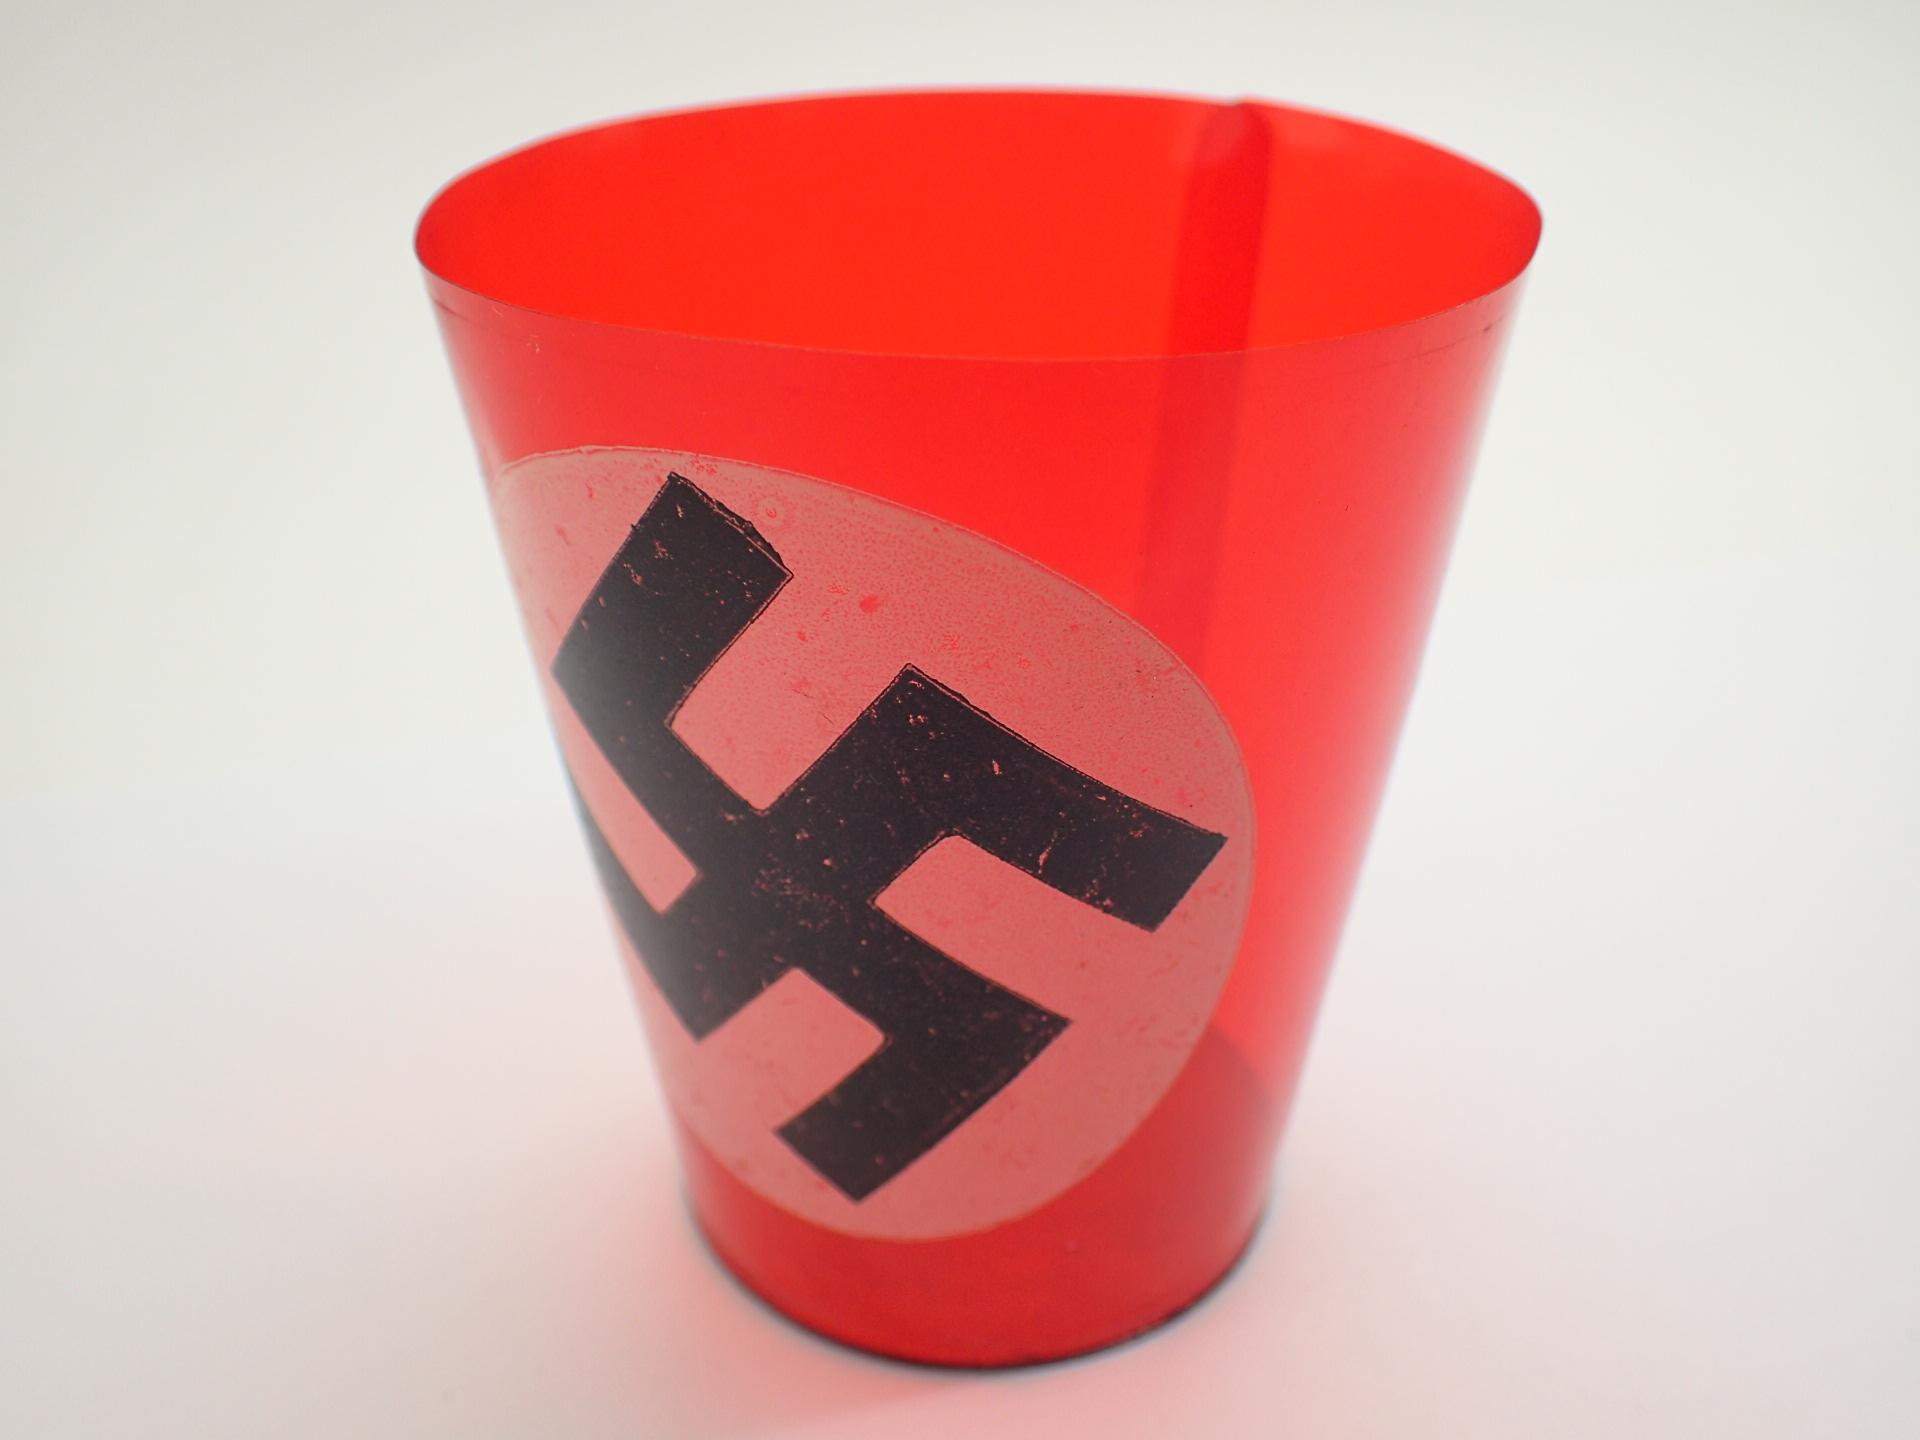 Lot 104 - WWII Swastika candle holder